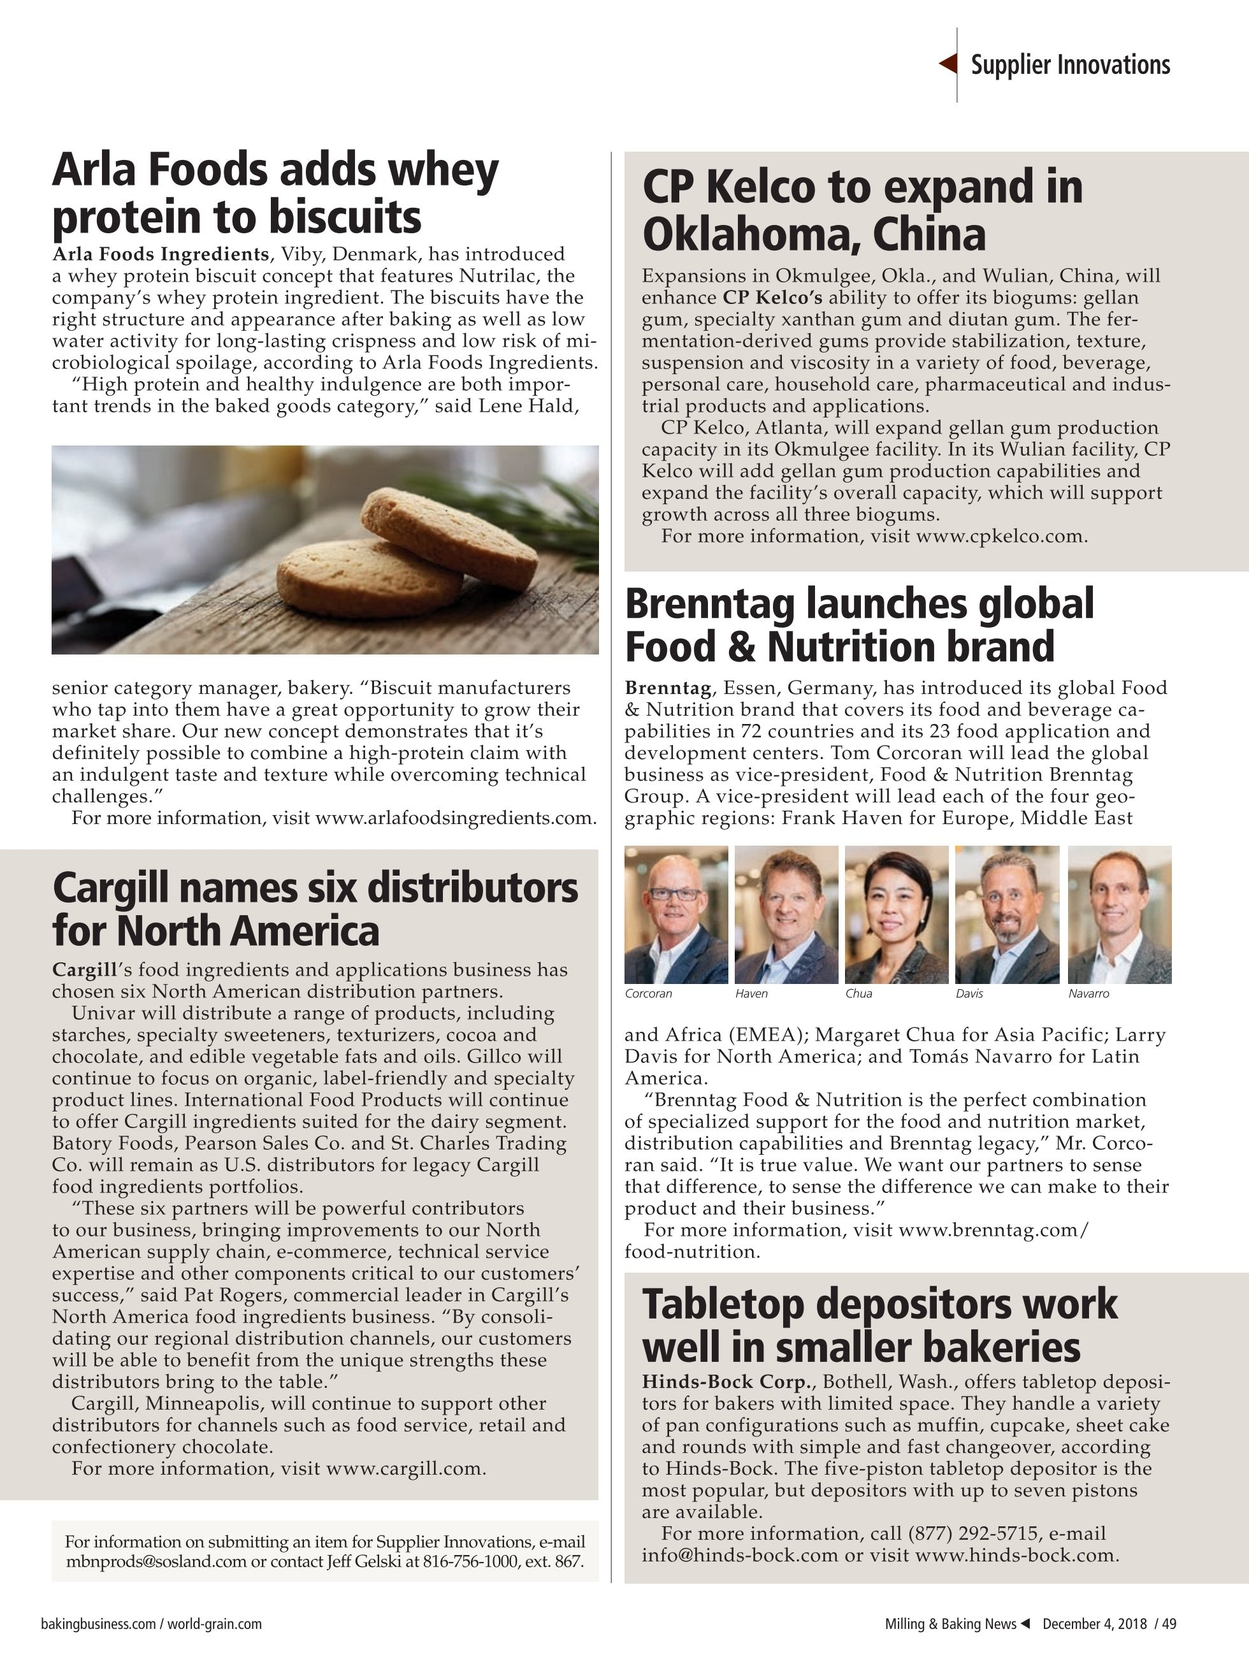 Milling & Baking News - December 4, 2018